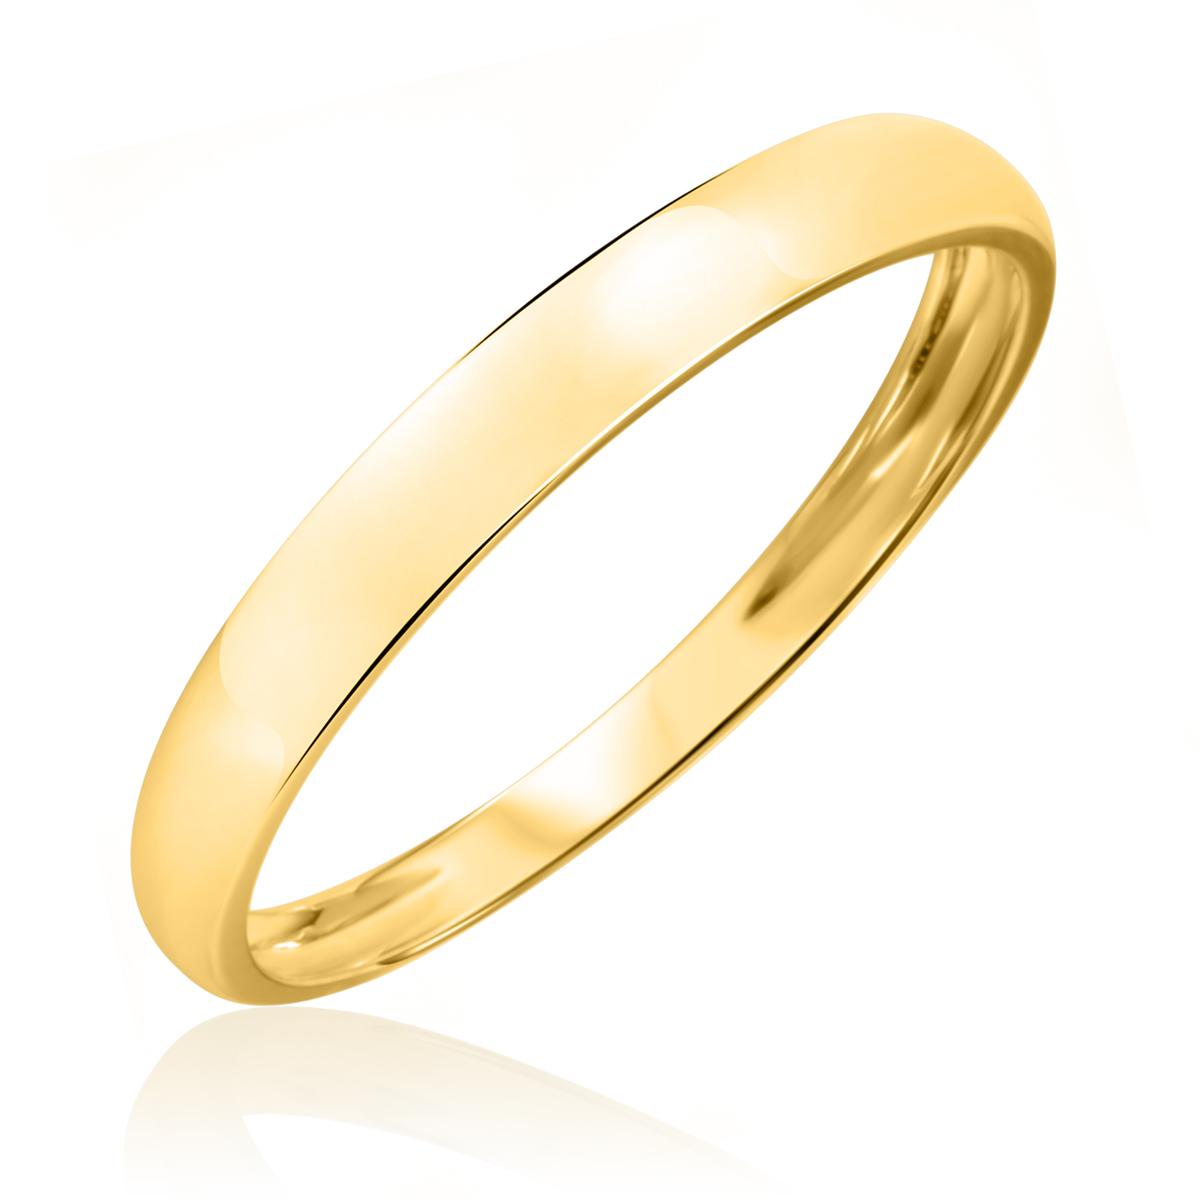 Traditional High Polish, 3 millimeter, 10K Yellow Gold Men's Wedding Band- Size